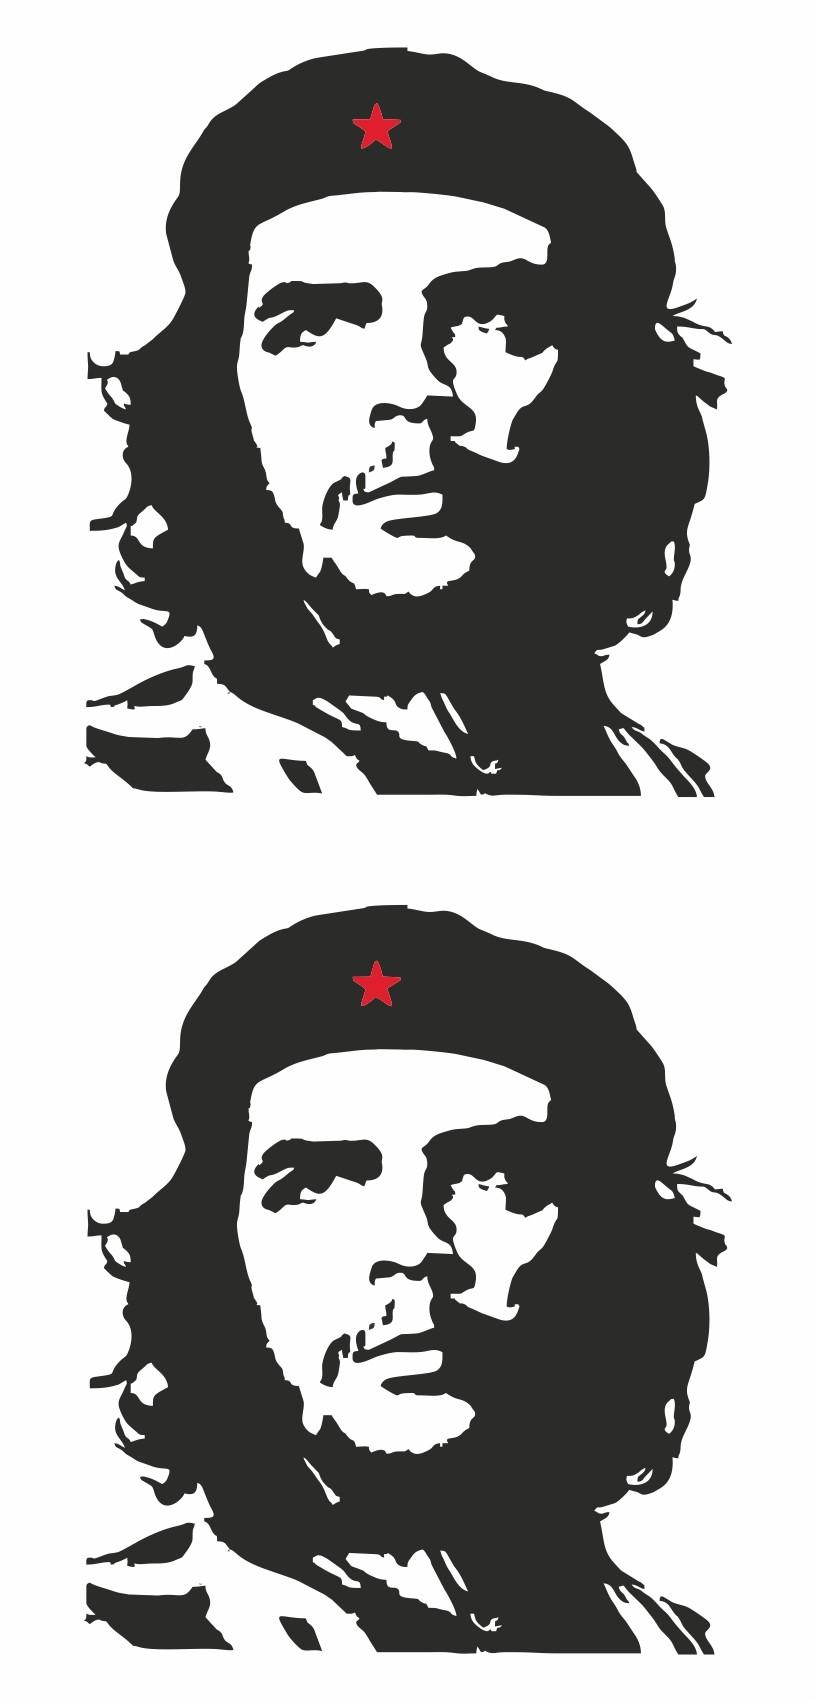 Sticker Che Guevara contour set of 2 135 x 110 mm